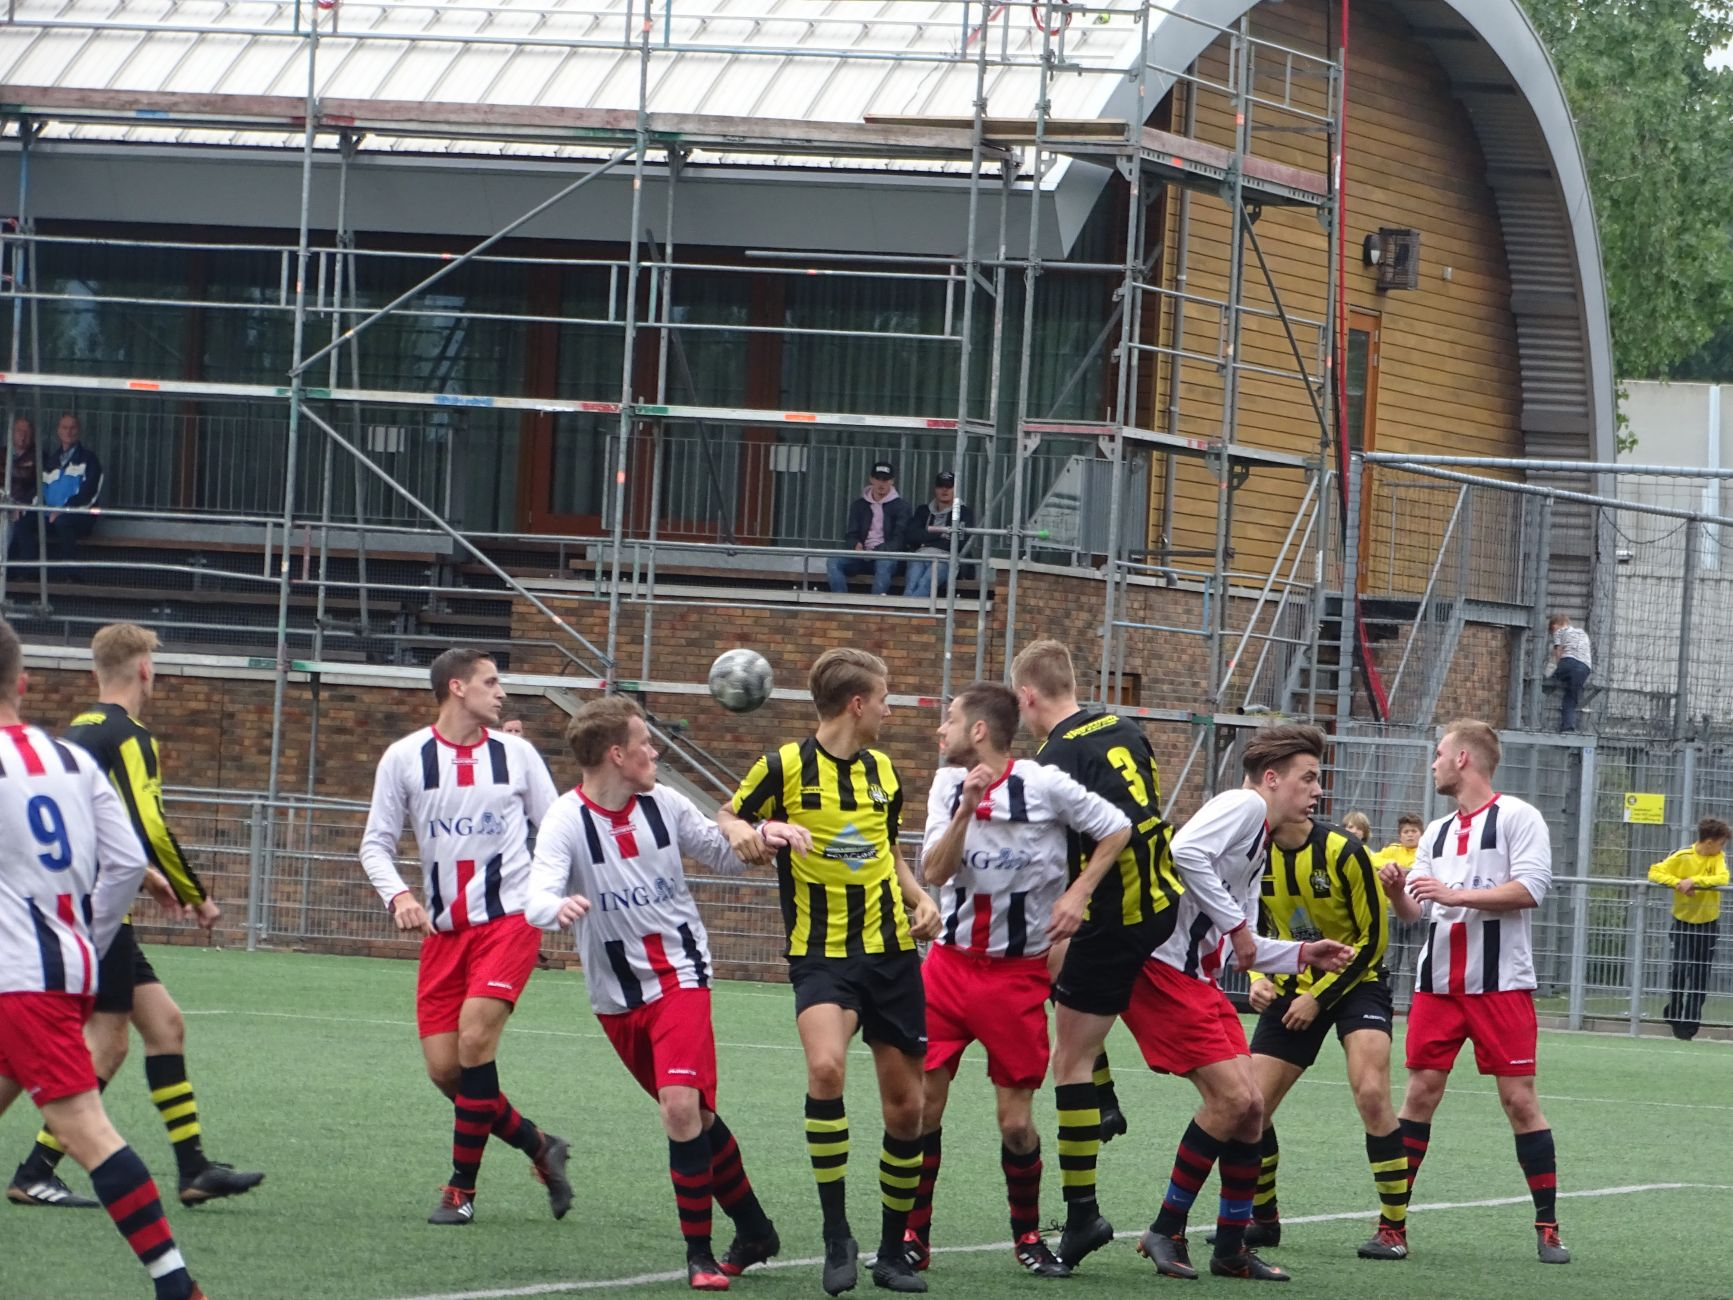 Gelijkspel in Vlaardingse derby